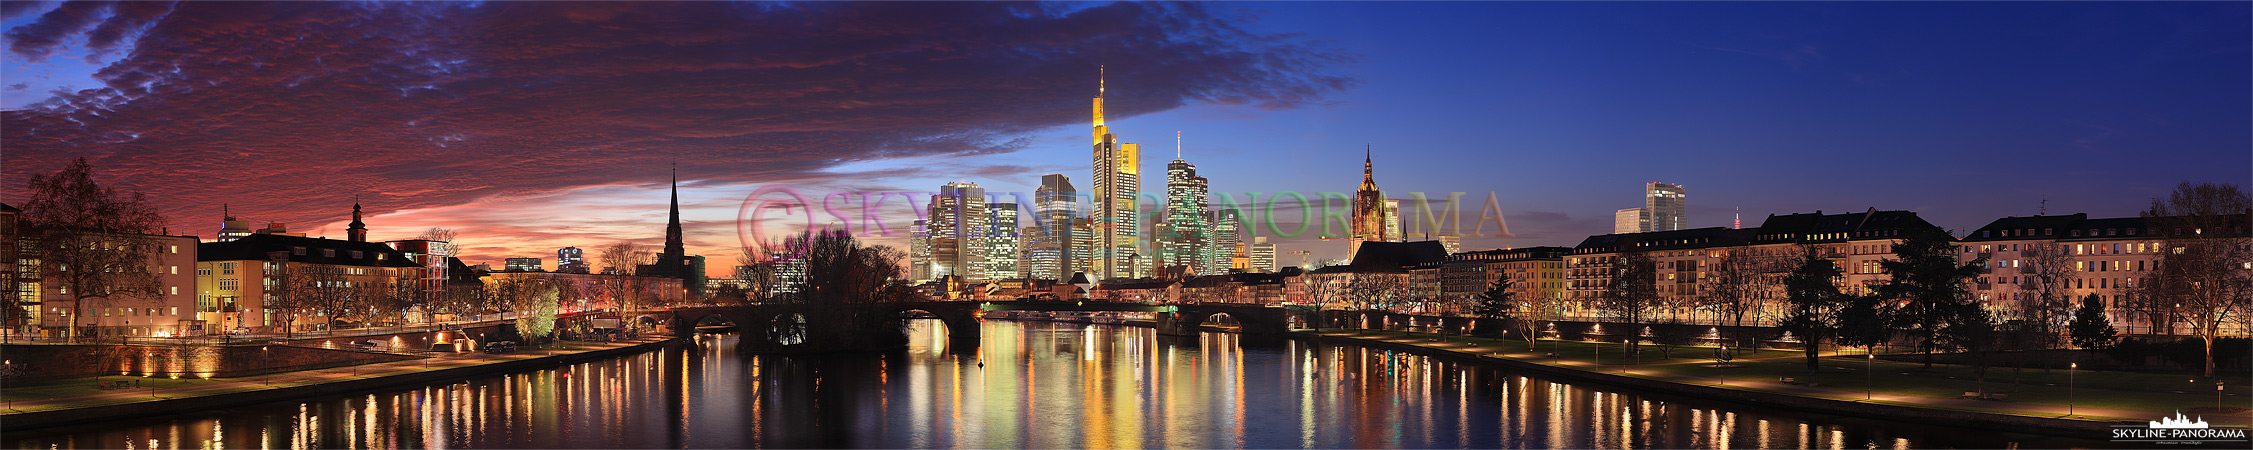 frankfurt skyline ansicht p 00666 skyline. Black Bedroom Furniture Sets. Home Design Ideas